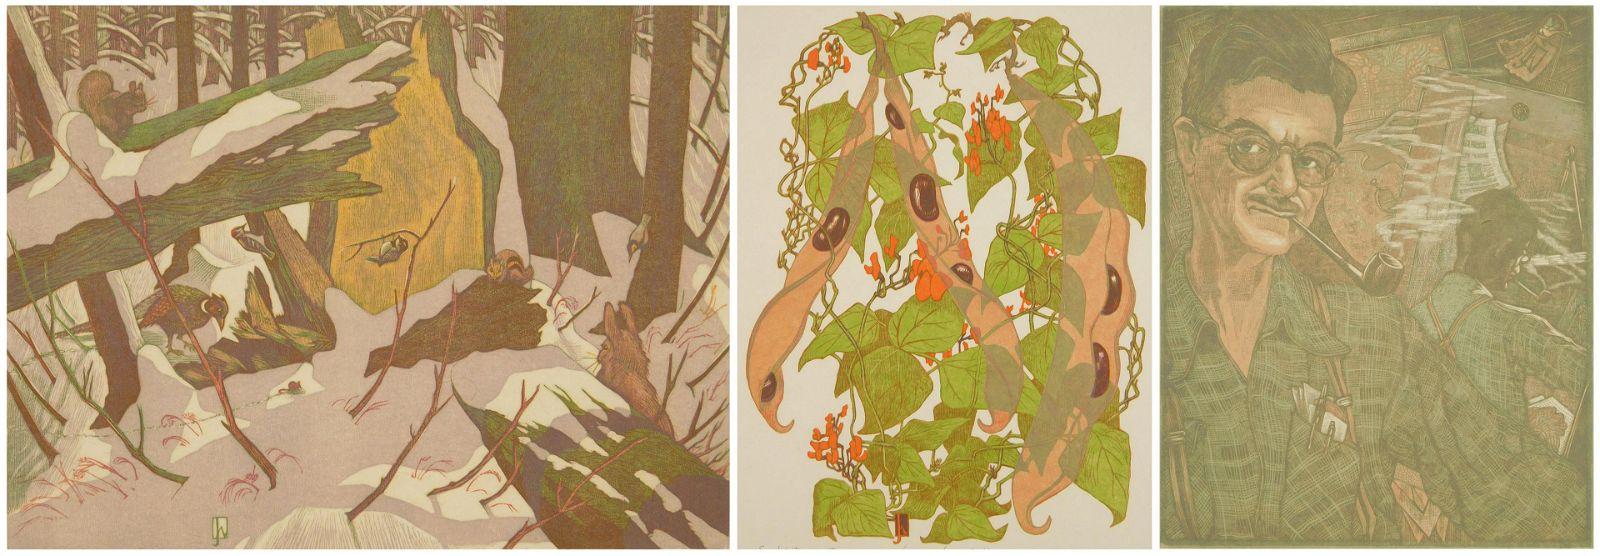 3 James D. Havens woodcuts